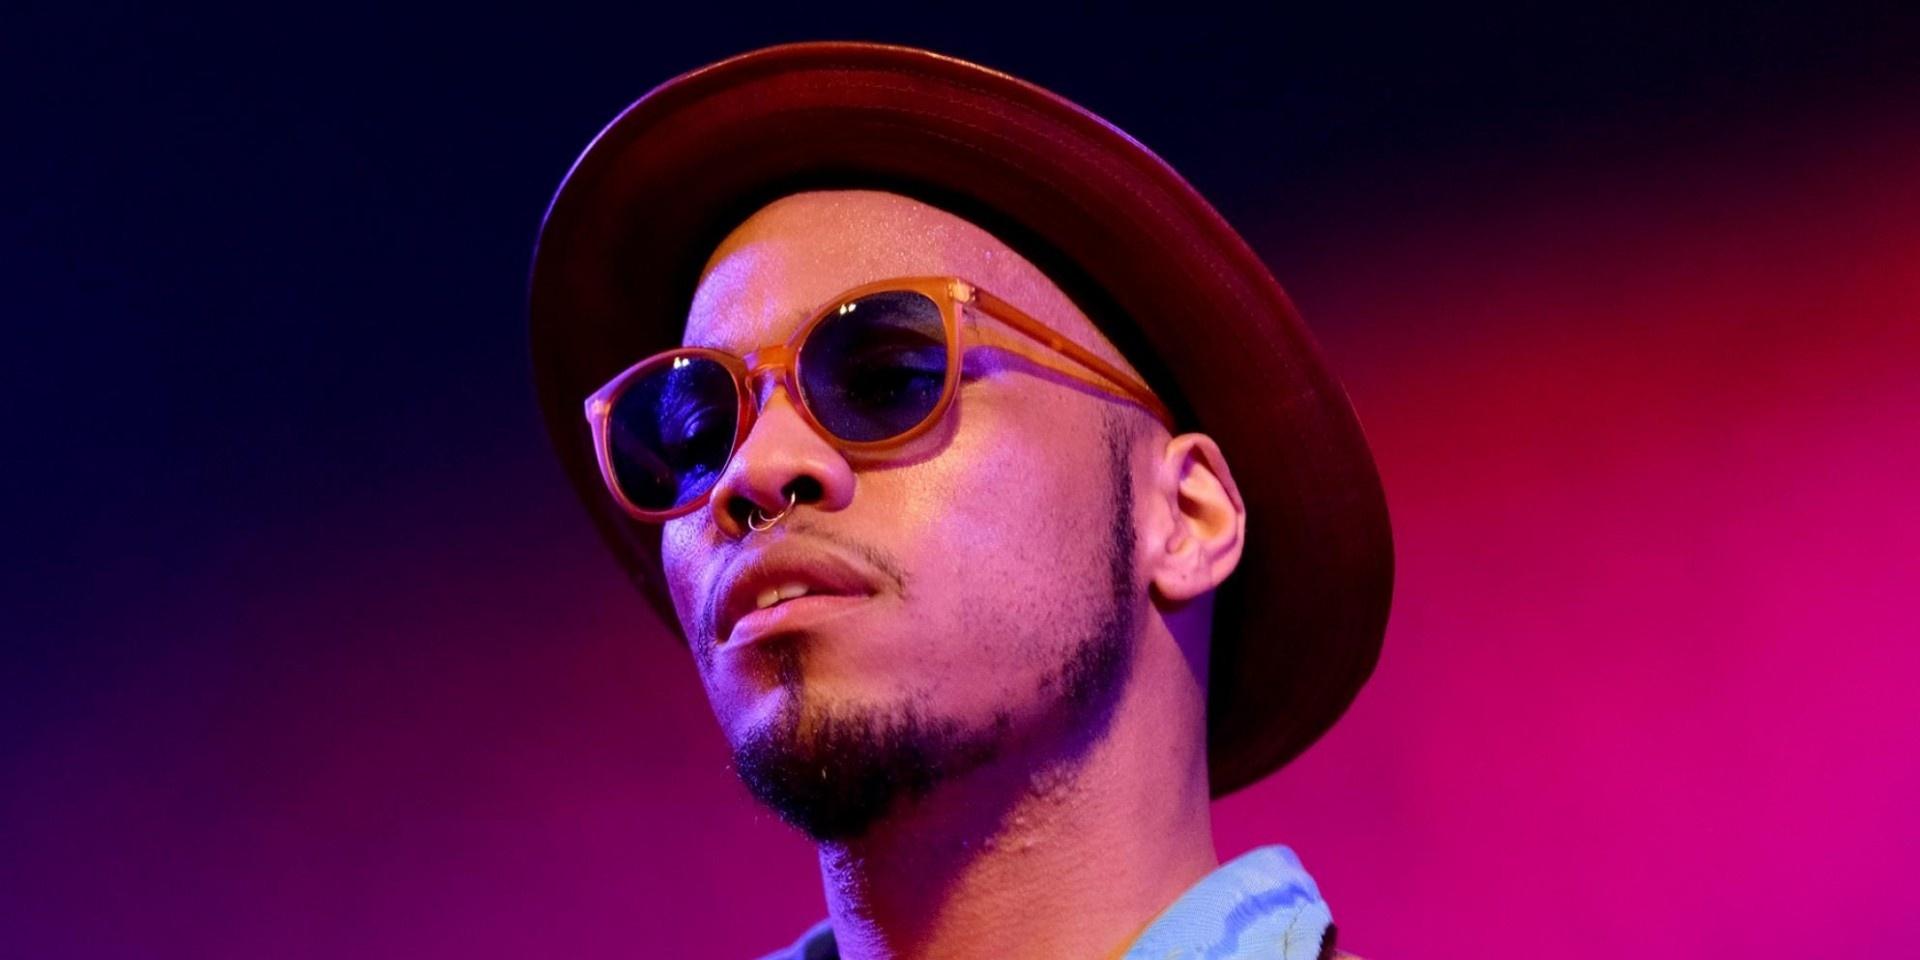 Anderson .Paak reveals release date of new album, Oxnard